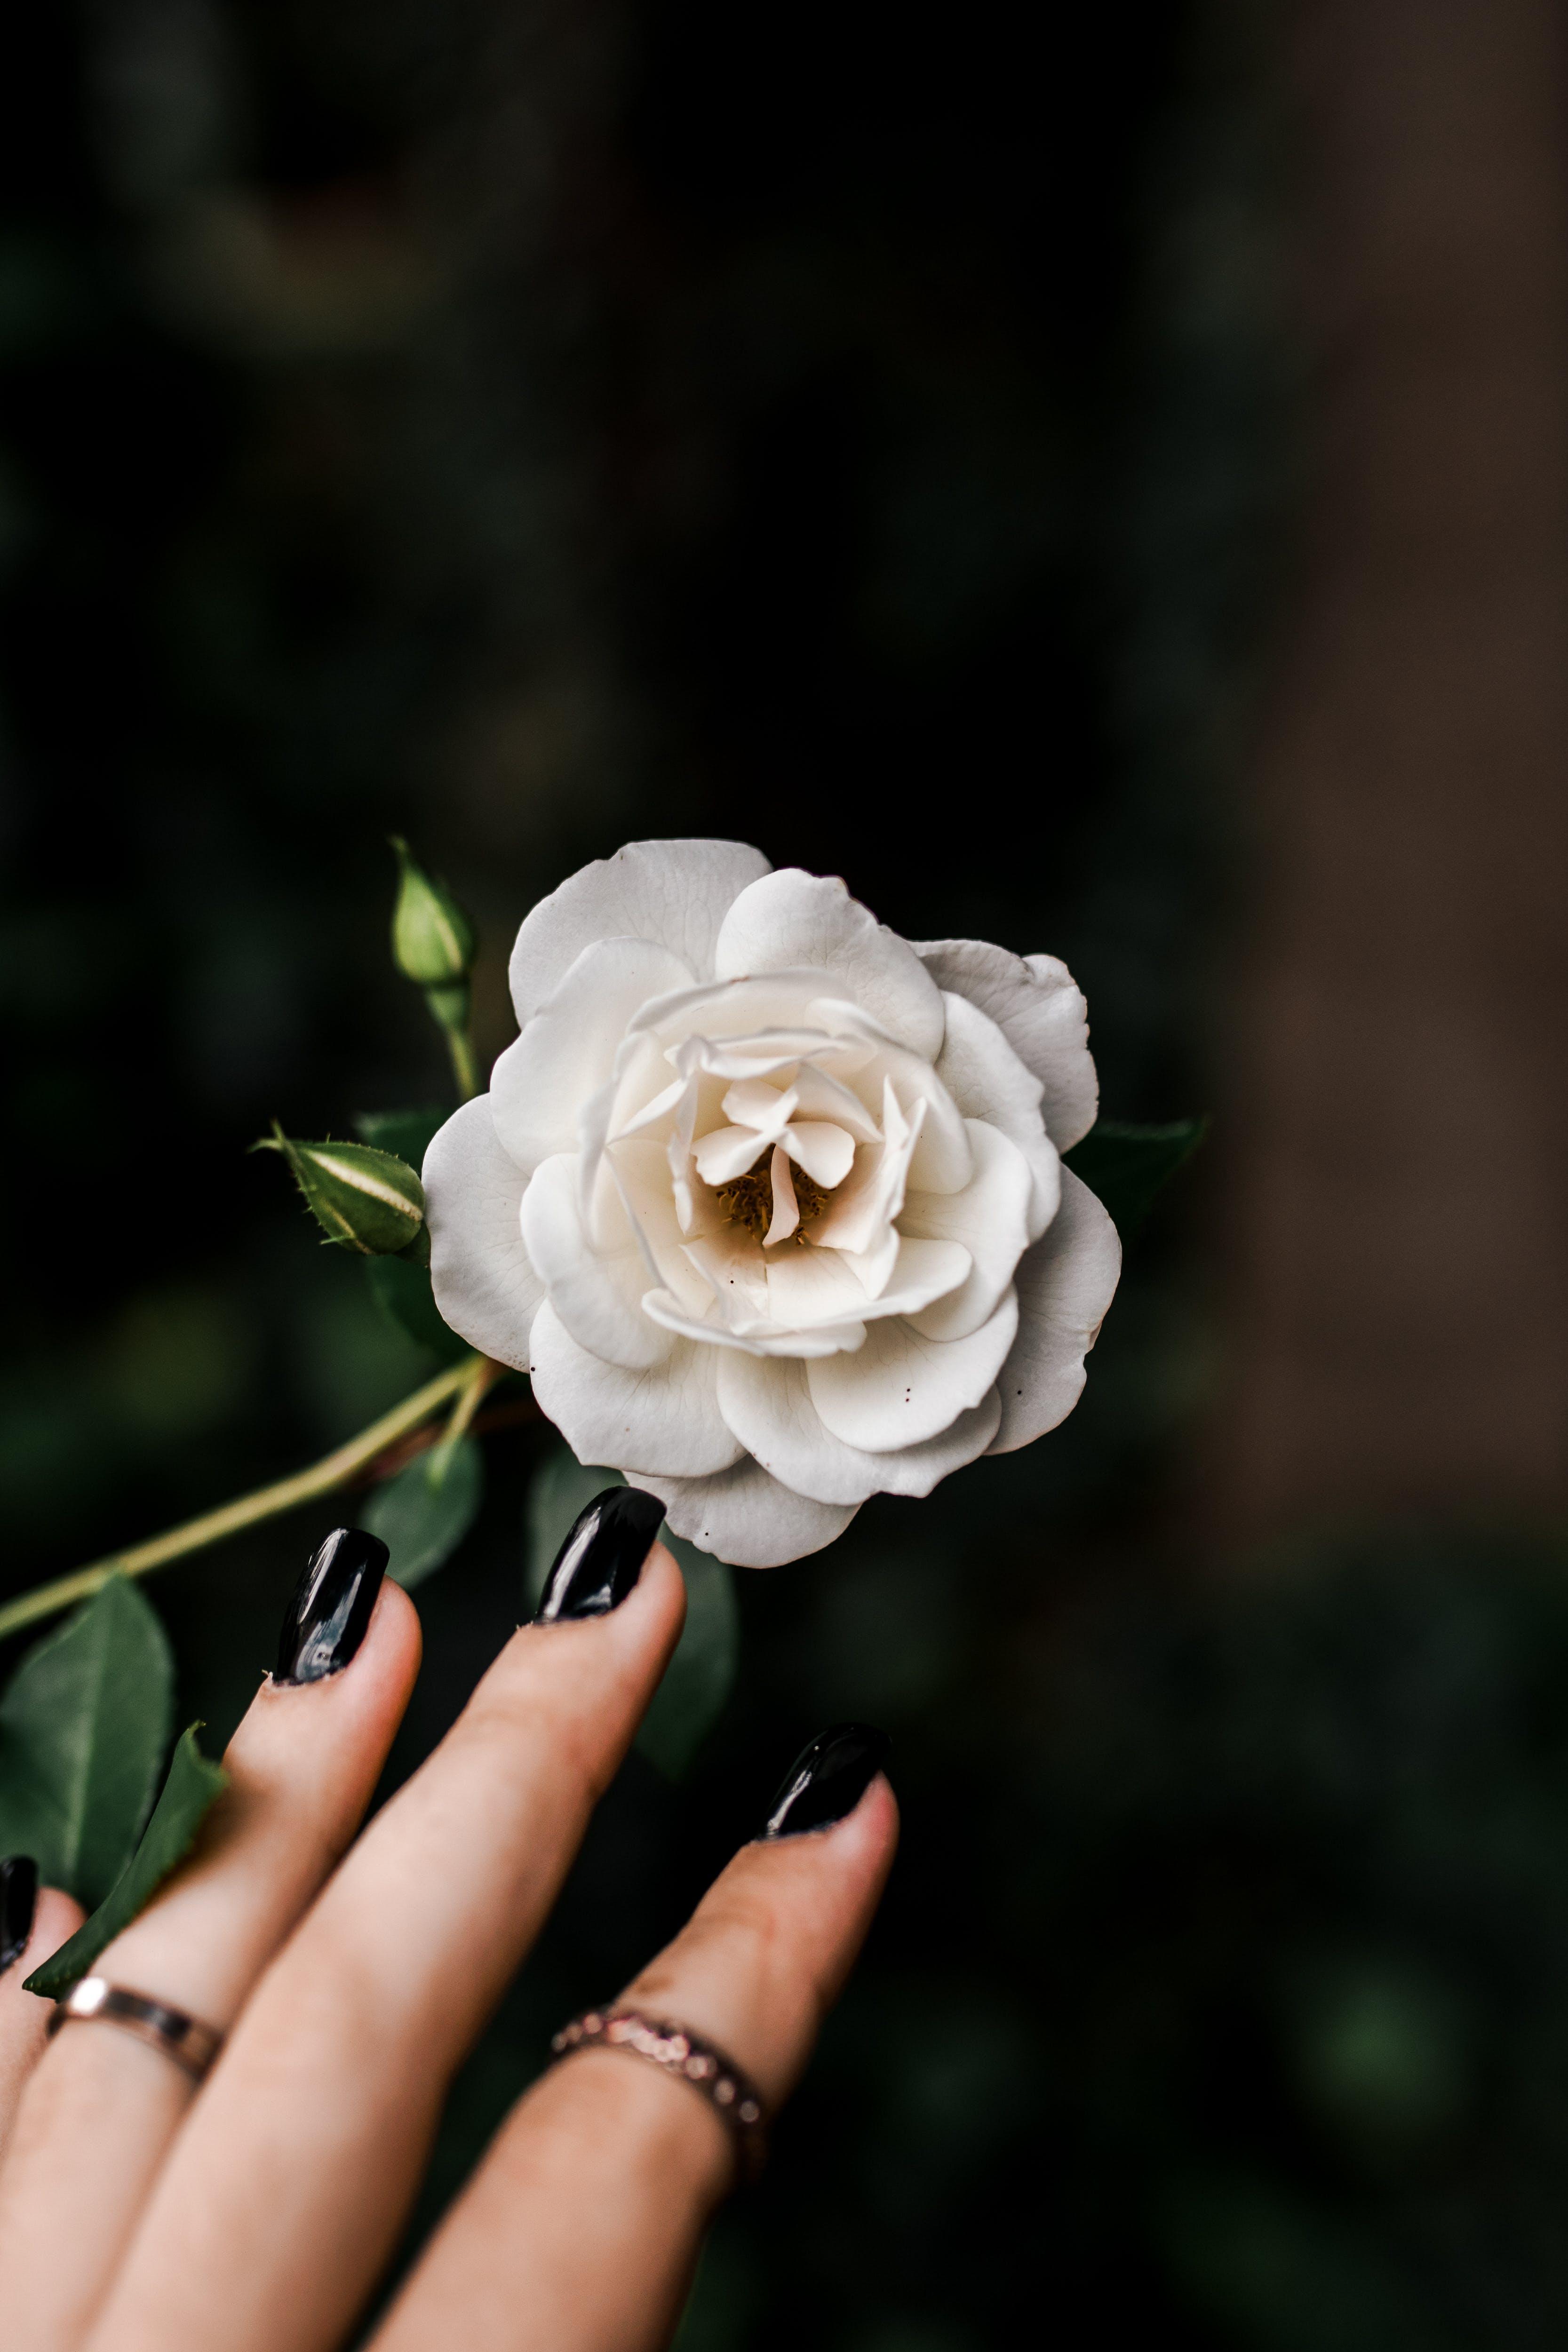 Woman Touching White Flower